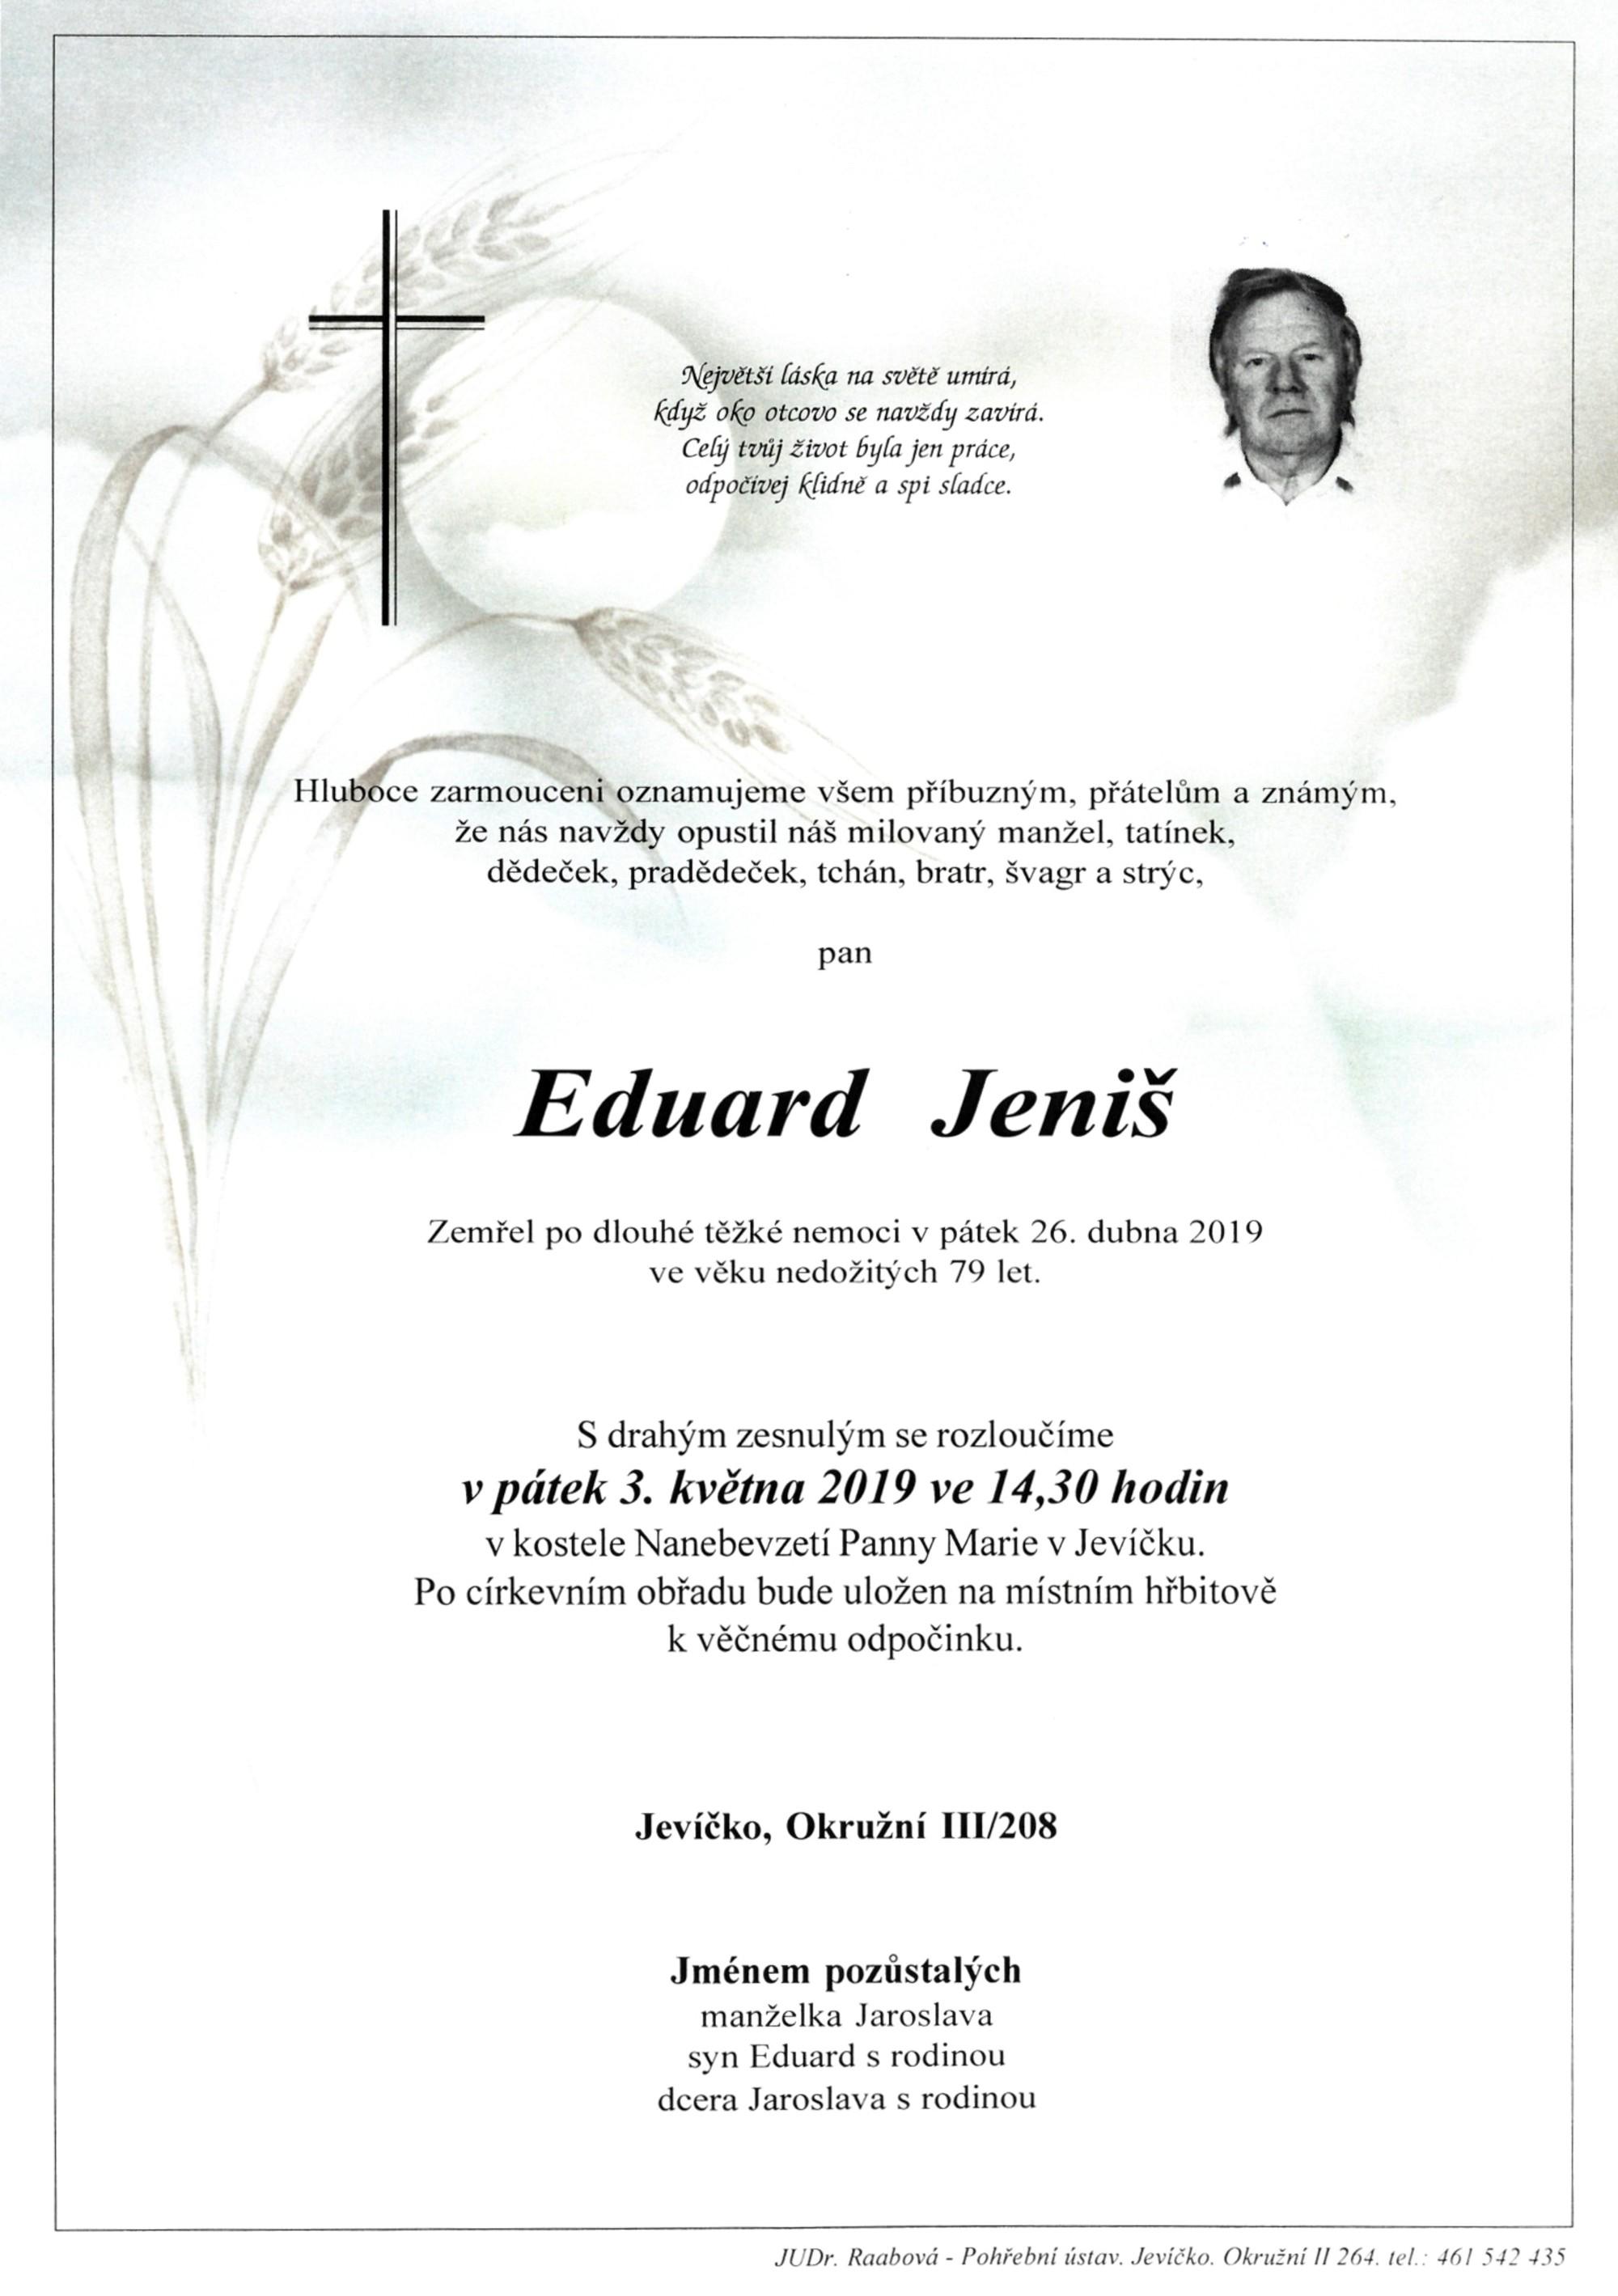 Eduard Jeniš